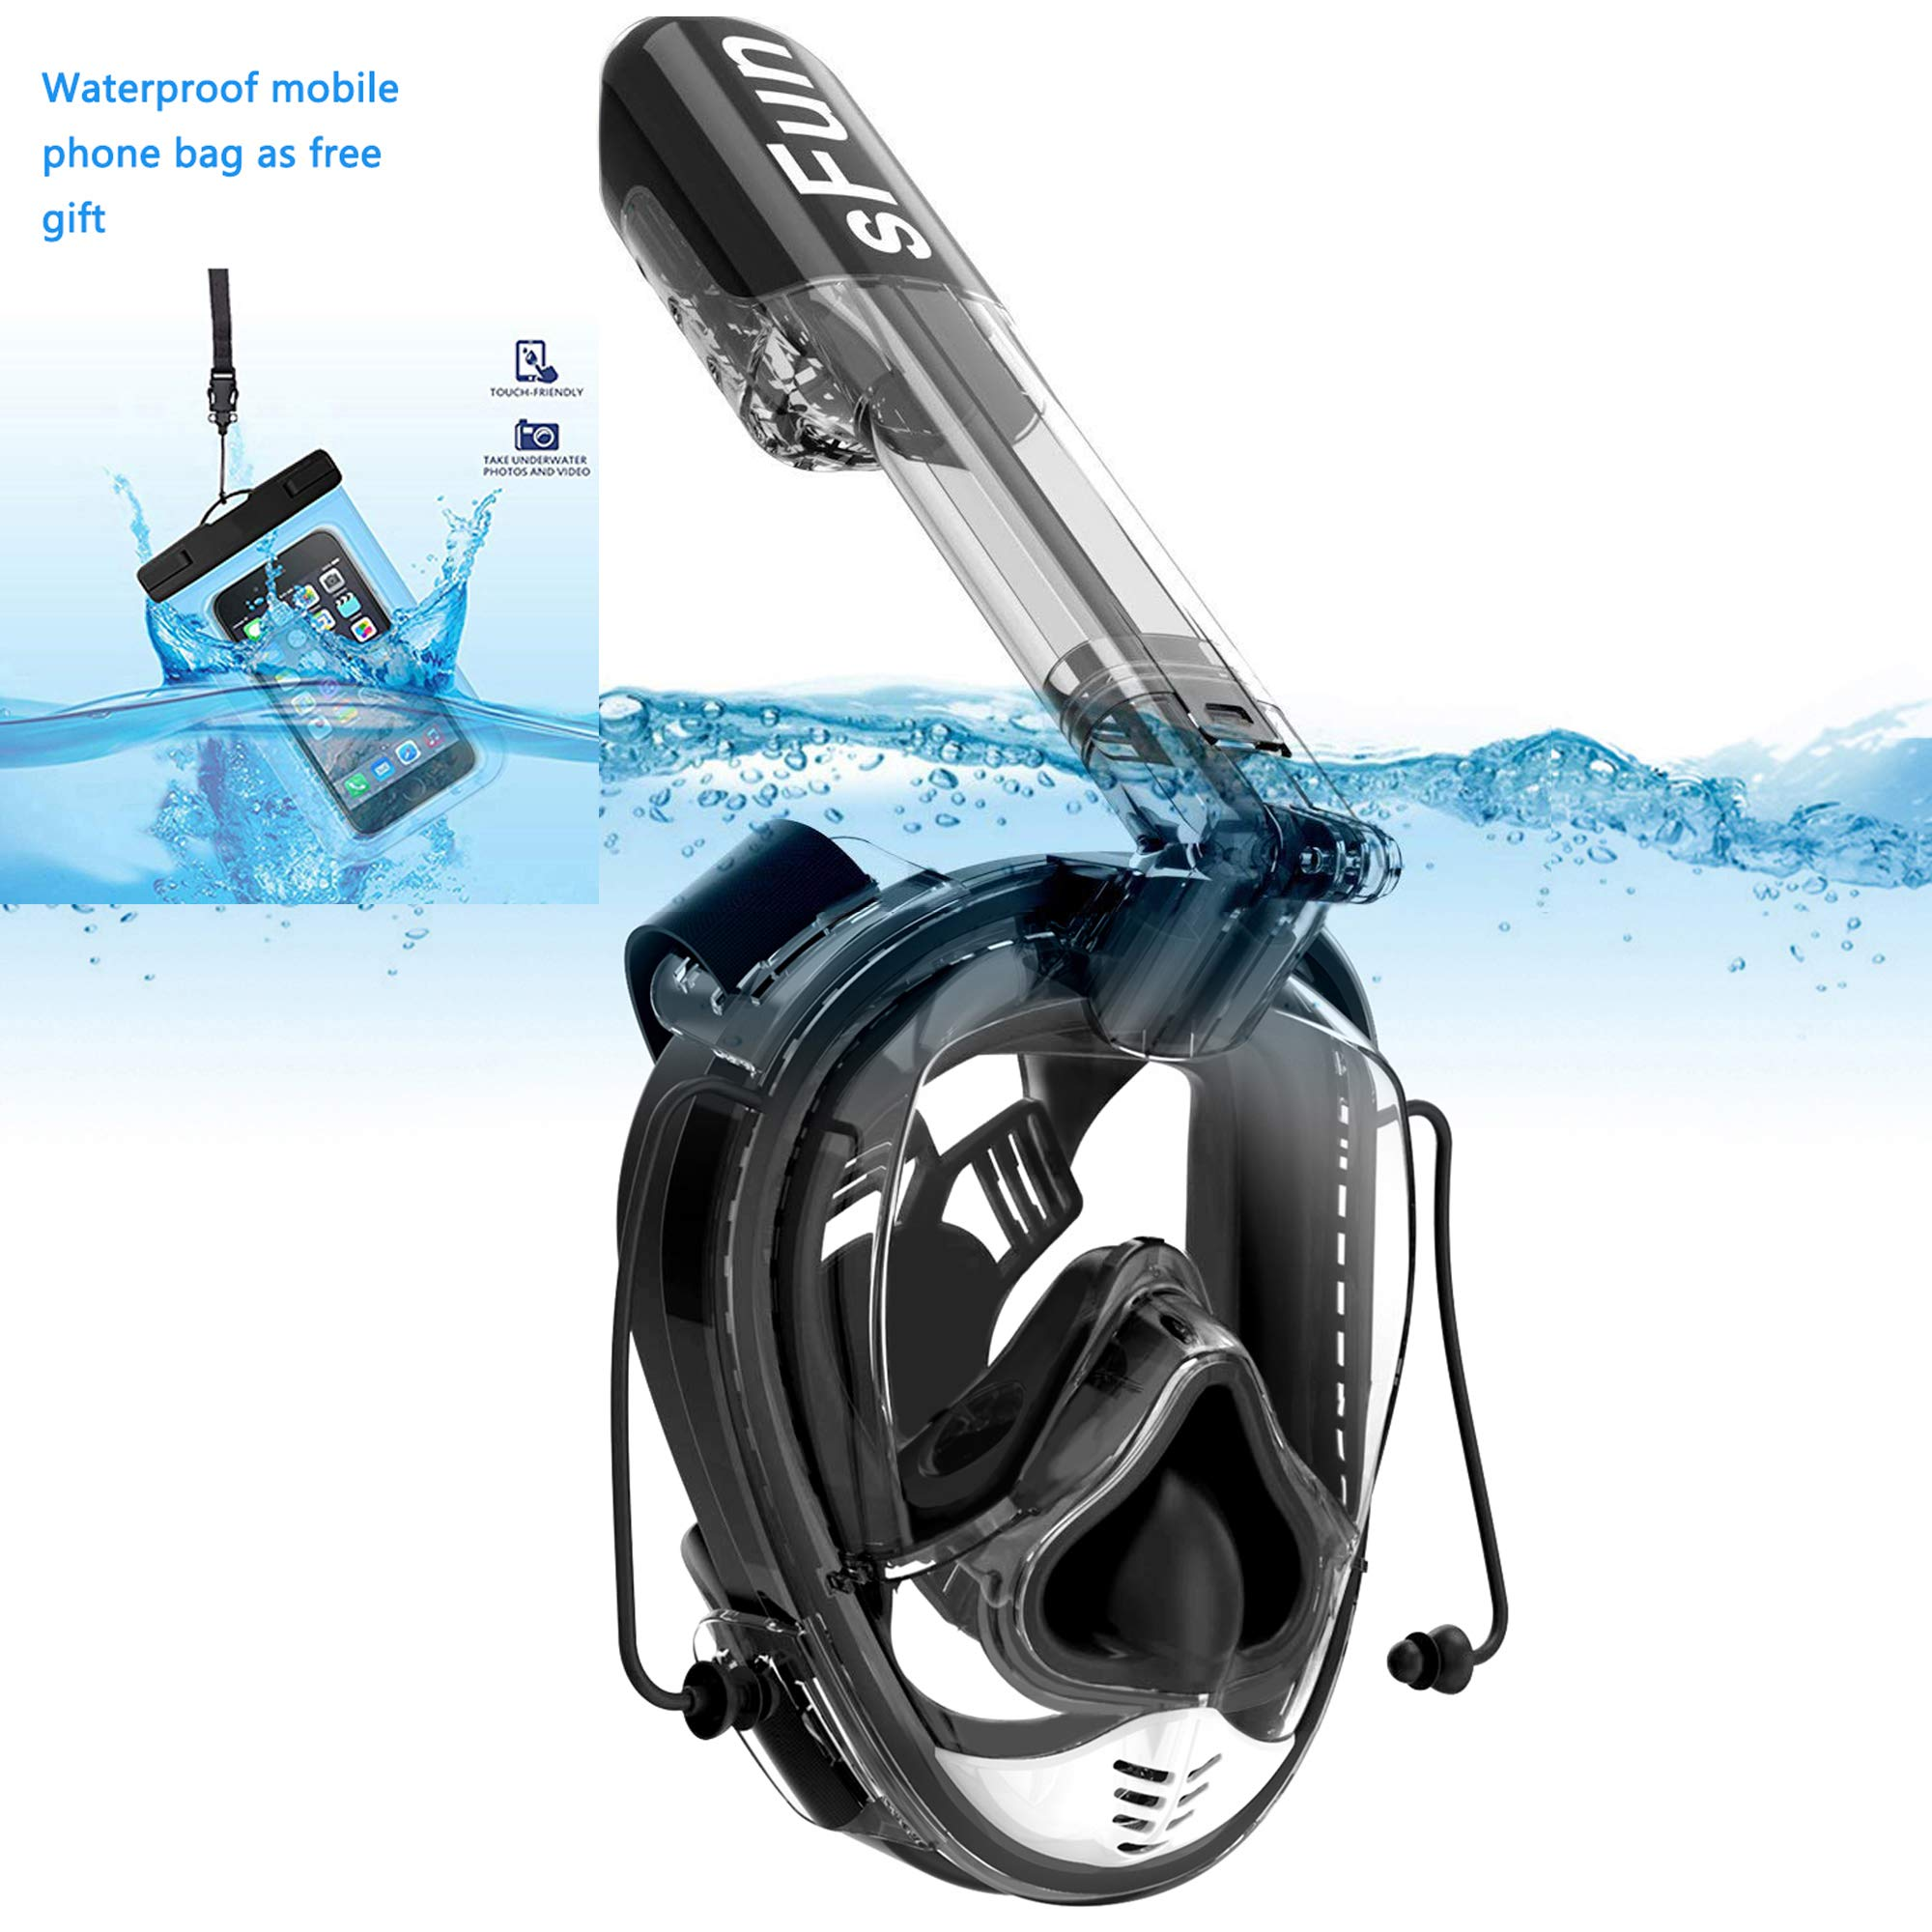 SFUN Snorkeling Mask Full Face Snorkel Mask Anti-Fog Panoramic Snorkel Mask for Scuba Diving Snorkeling (Black) by SFUN